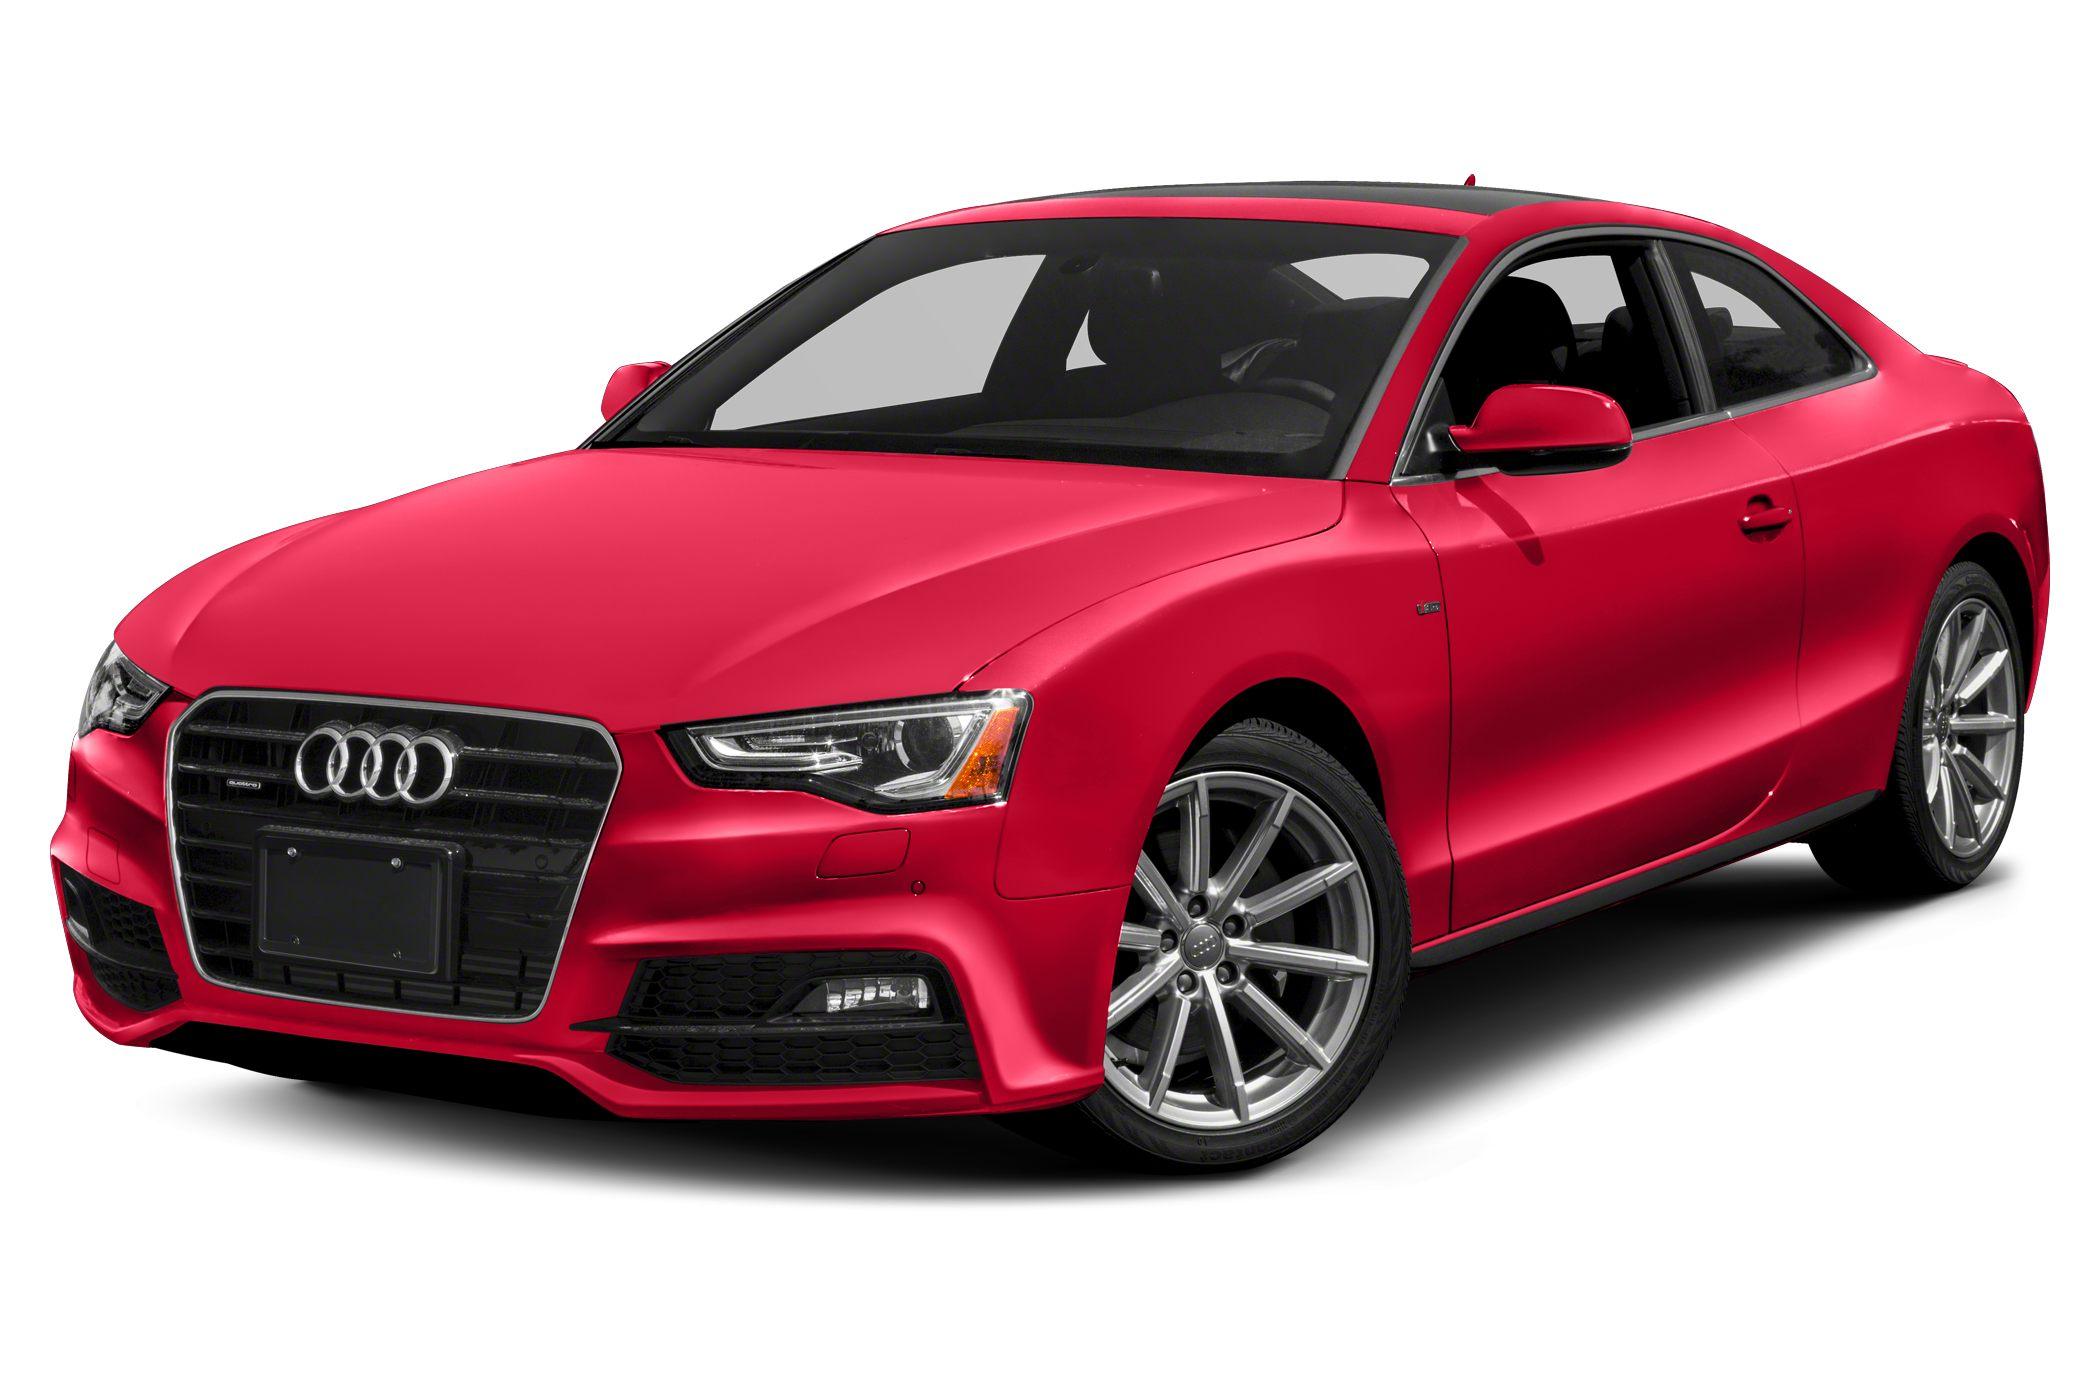 2017 Audi A5 Information